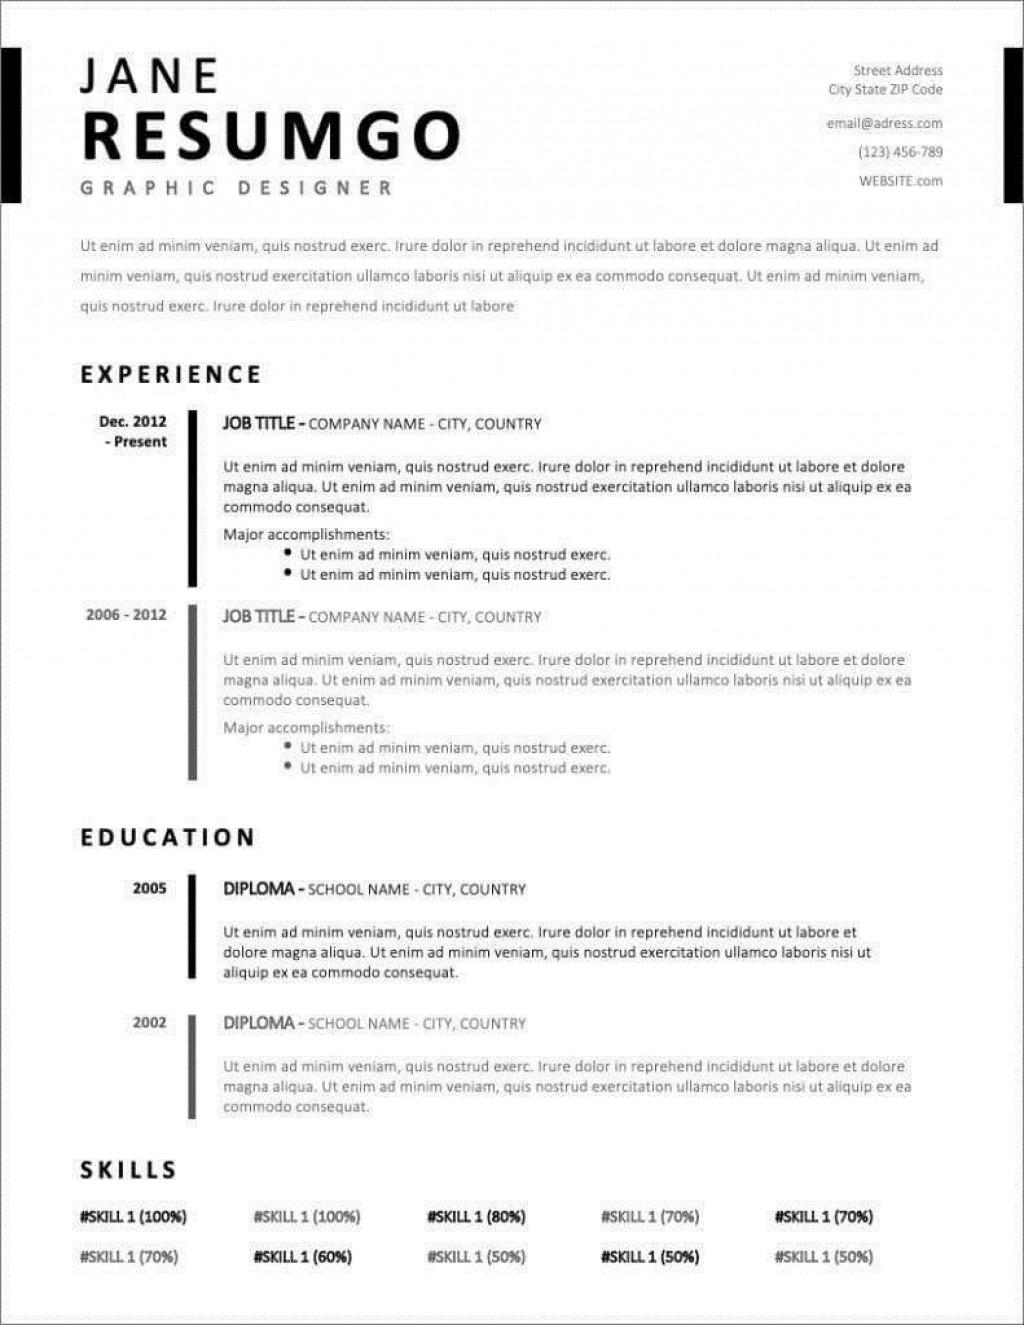 002 Fascinating Download Resume Sample Free Idea  Teacher Cv Graphic Designer Word Format Nurse TemplateLarge